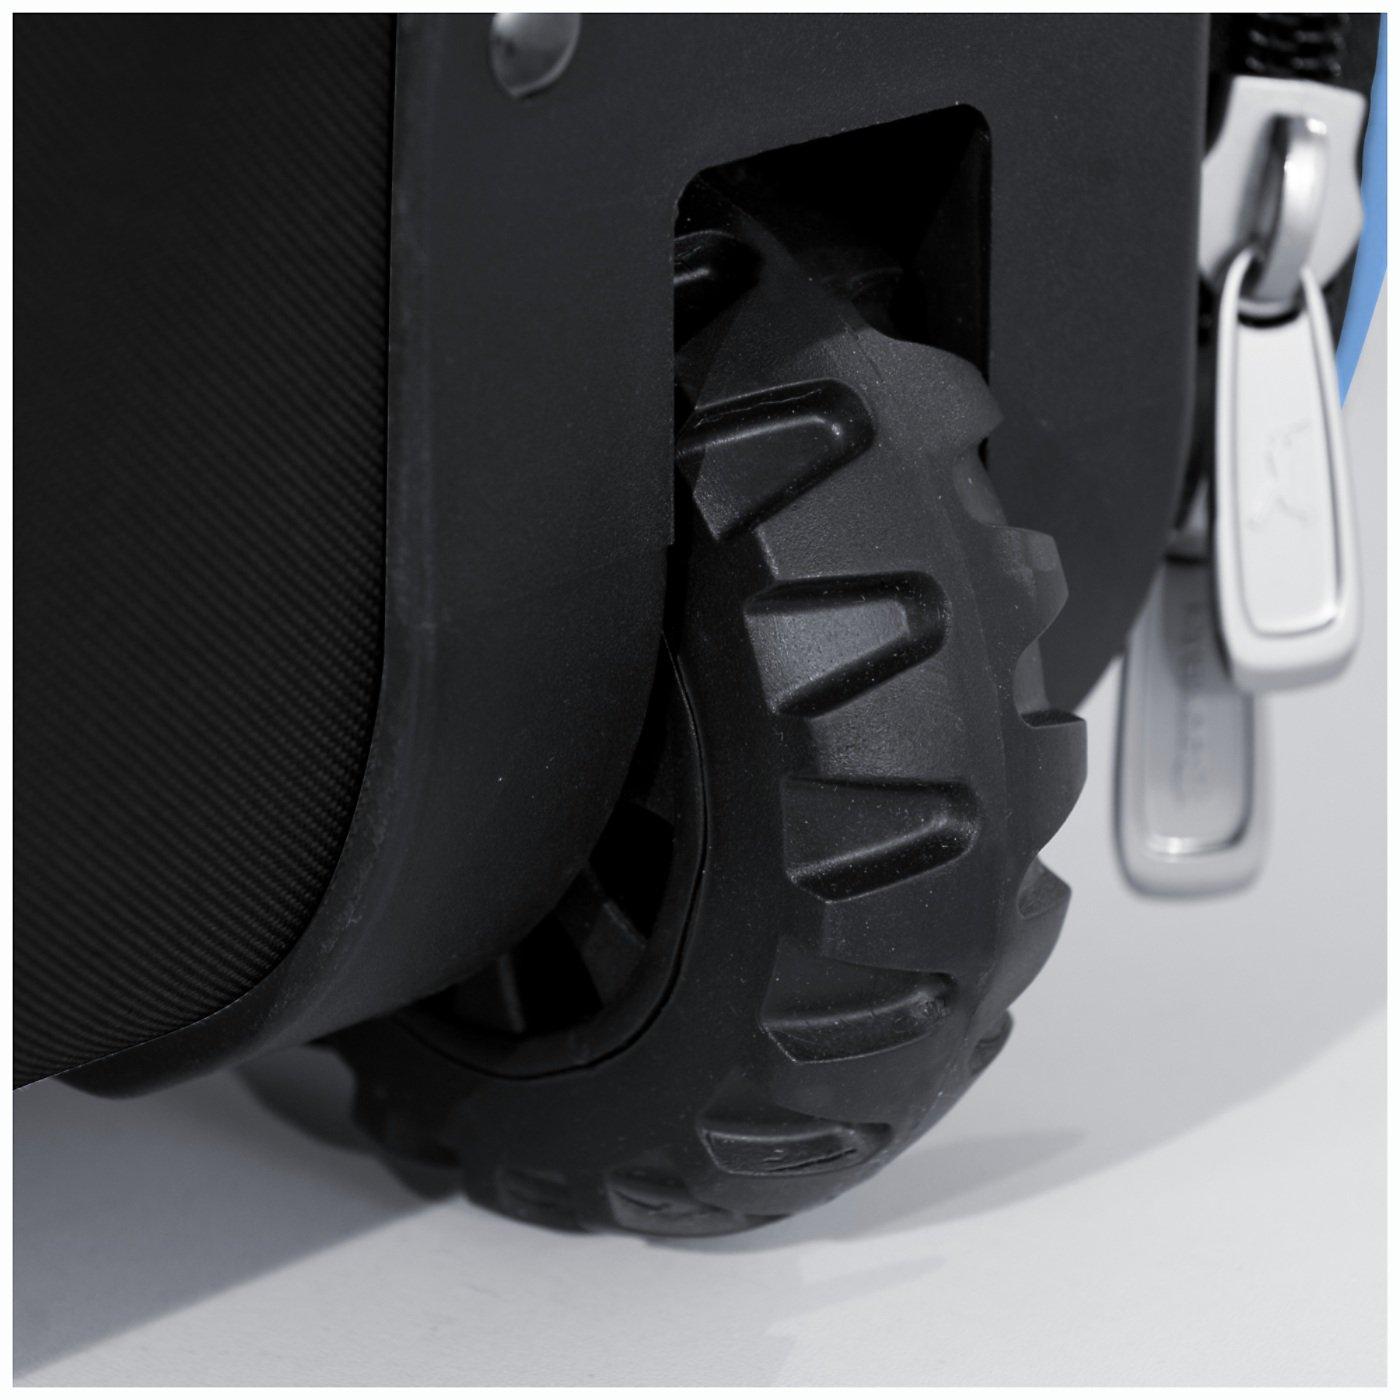 Boombah Beast Baseball/Softball Bat Bag - 40'' x 14'' x 13'' - Black/Columbia Blue - Holds 8 Bats, Glove & Shoe Compartments by Boombah (Image #5)